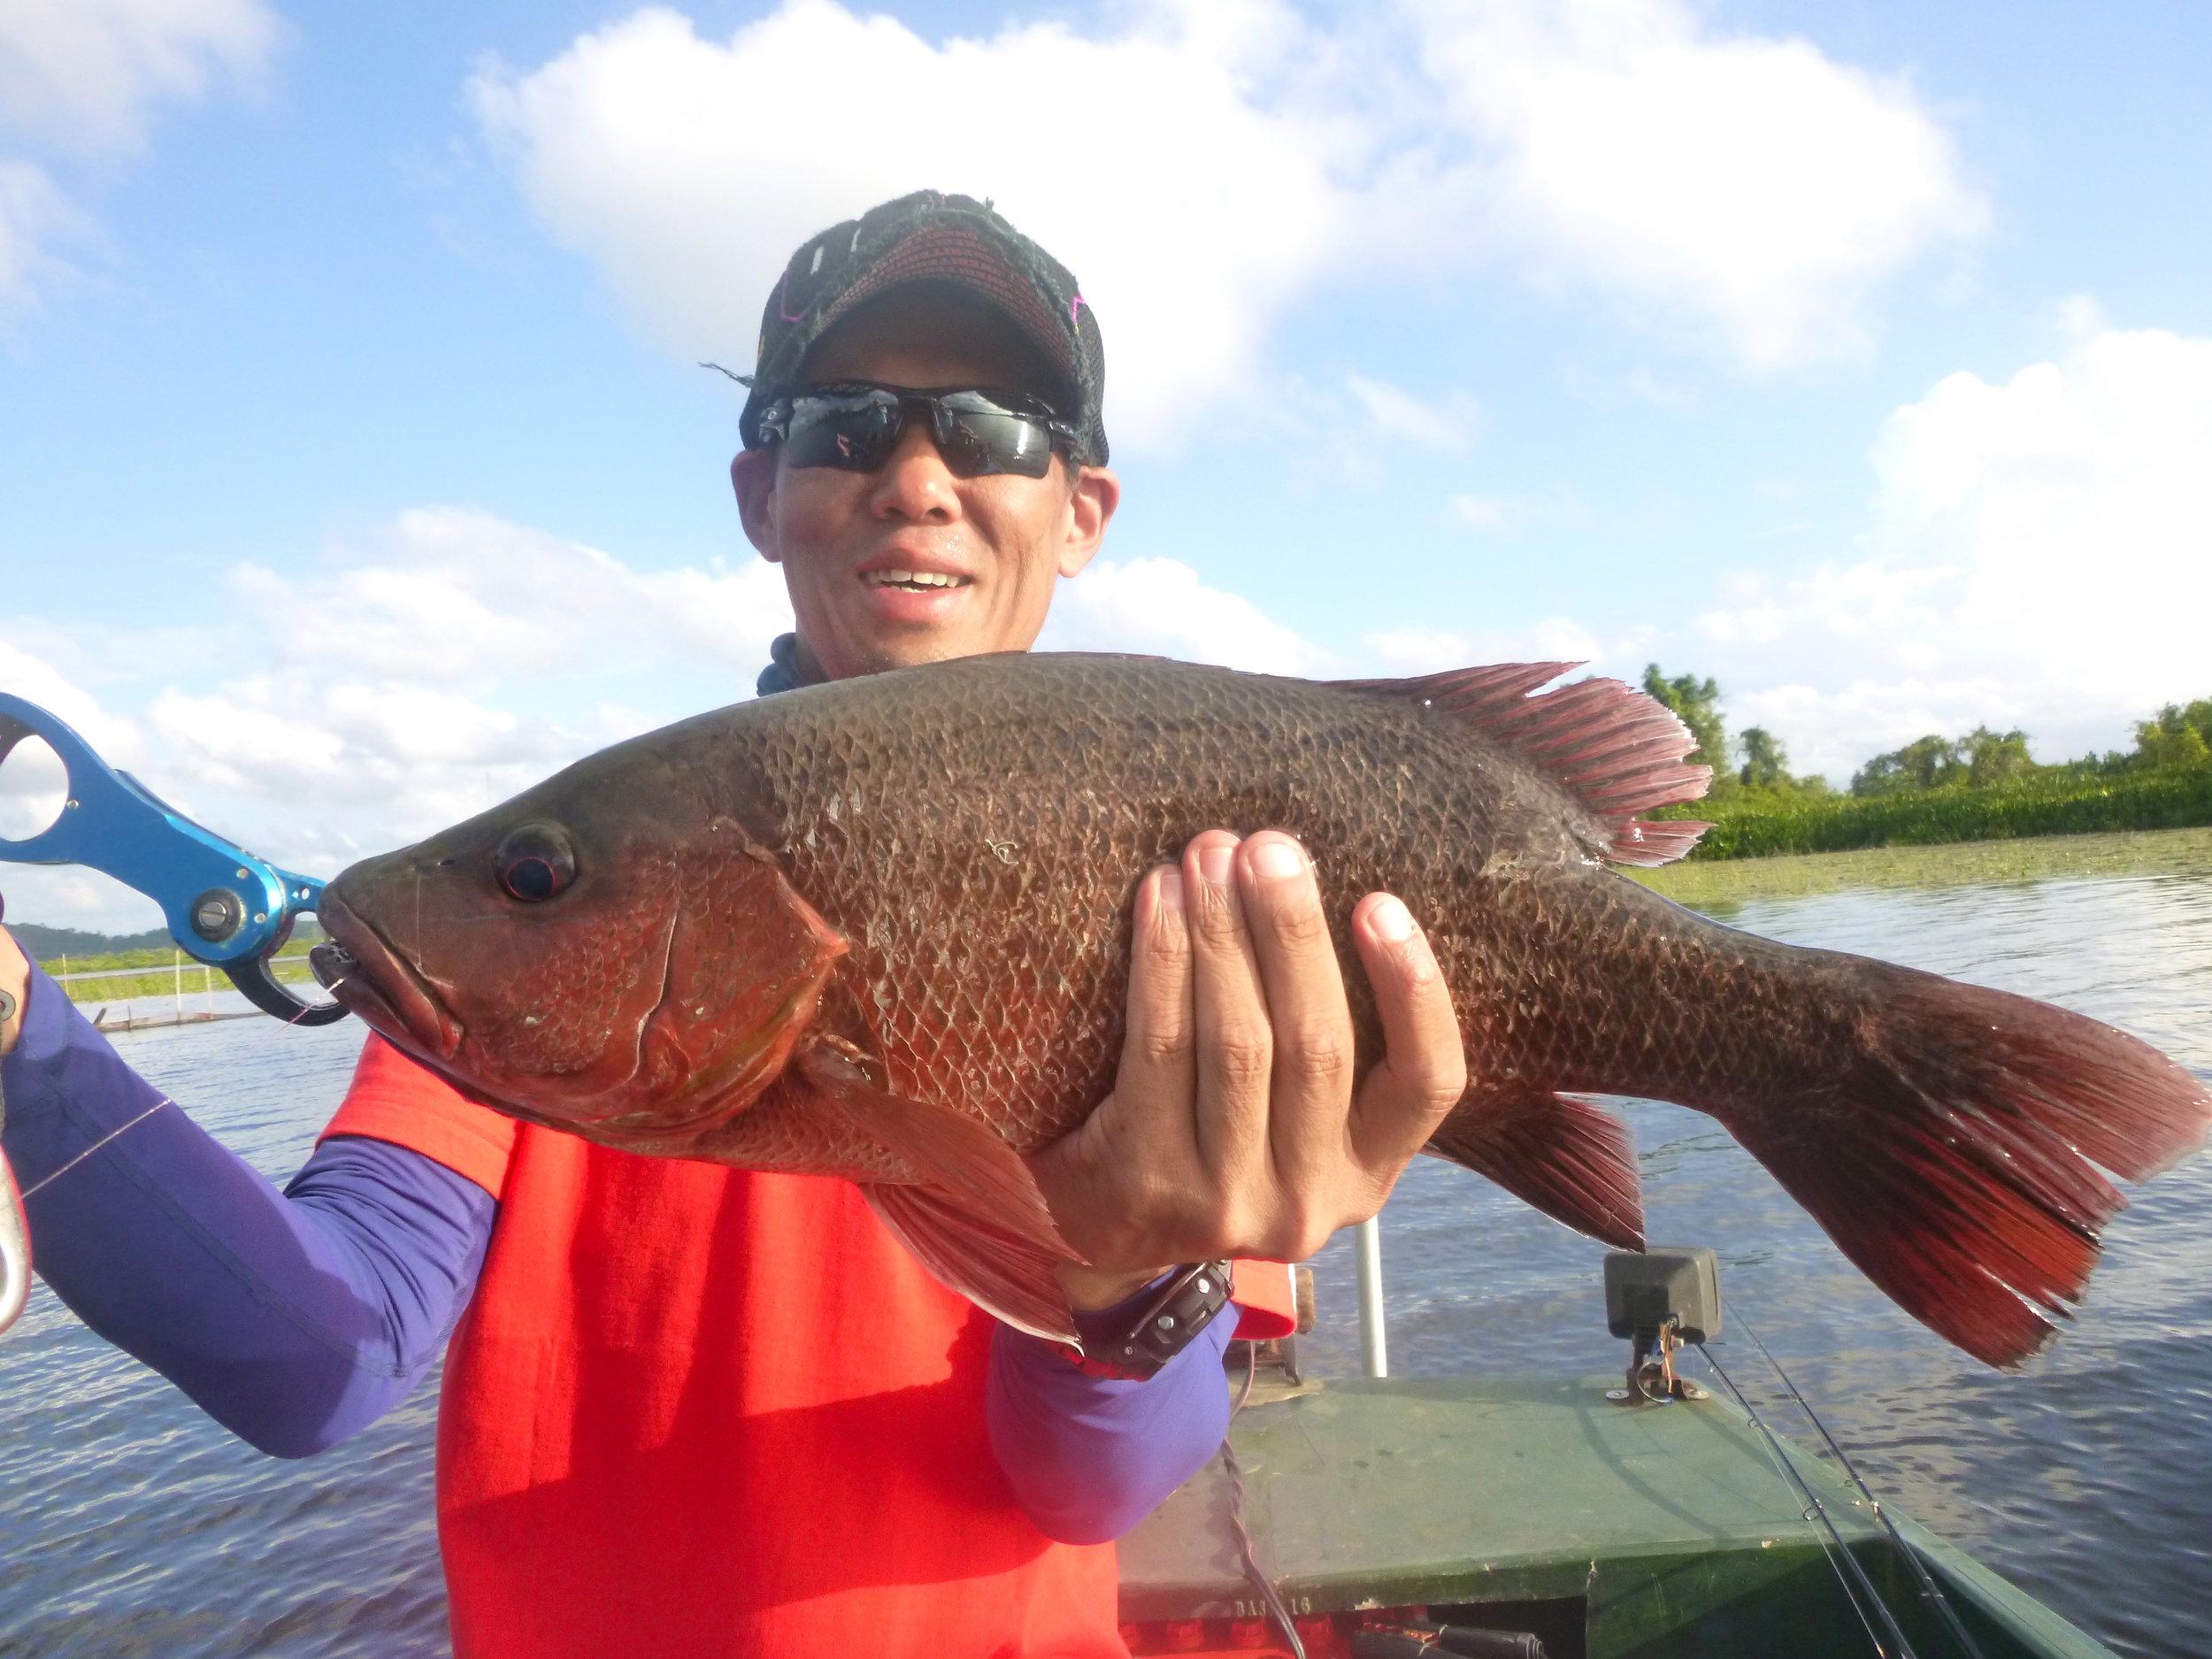 Sportfishing Lanka Bolgoda Lake Fishing Mangrove Jack 2.JPG